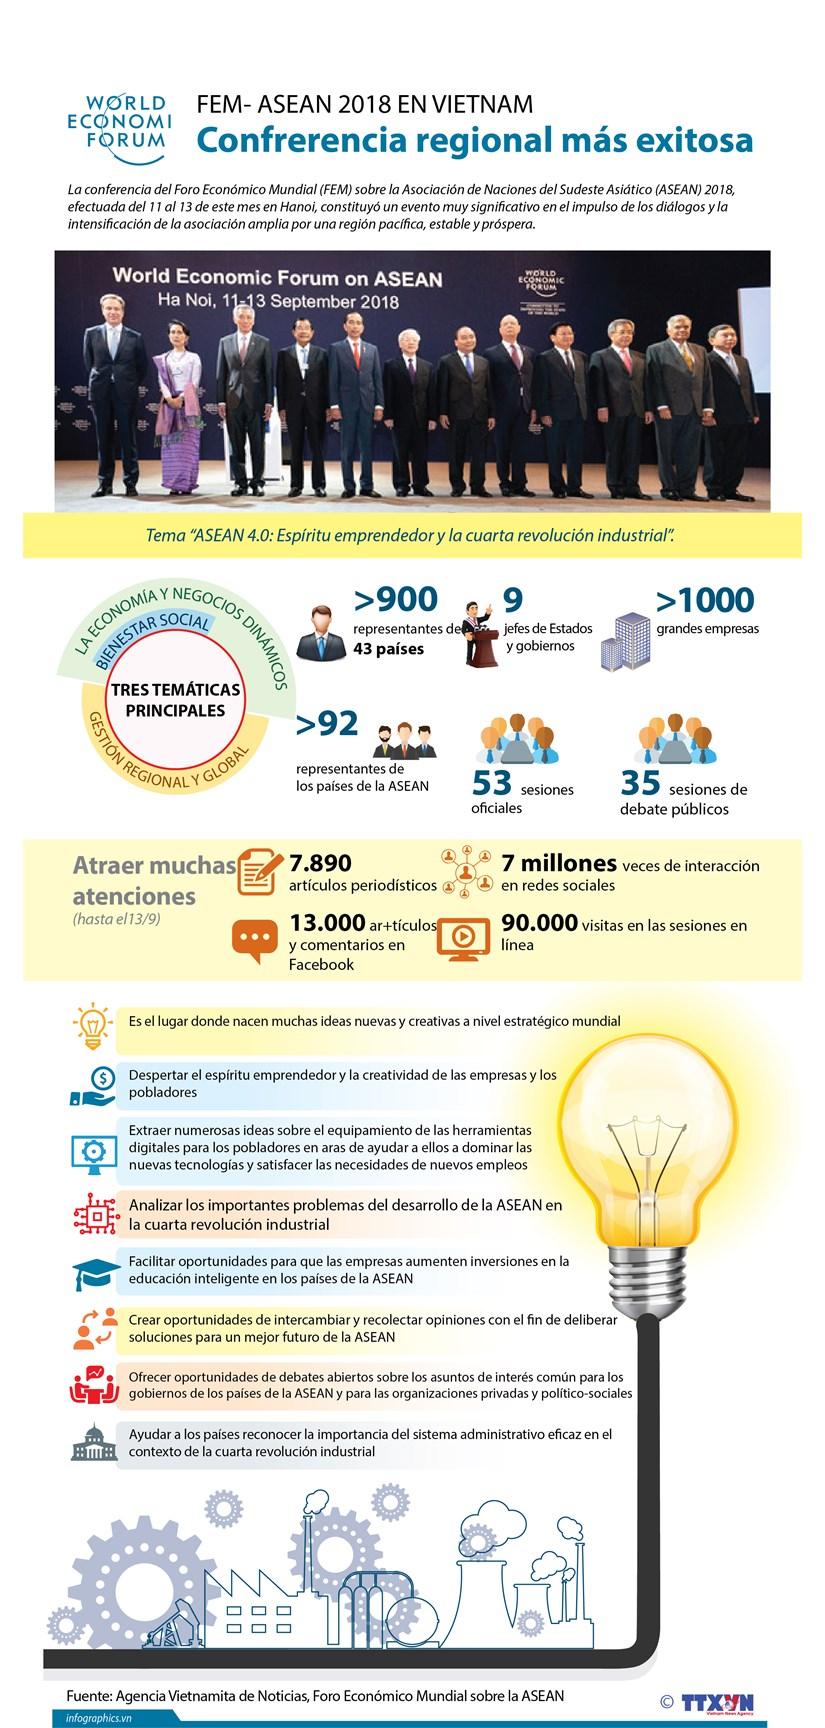 (Infografia) FEM- ASEAN 2018 en Vietnam: confrerencia regional mas exitosa hinh anh 1